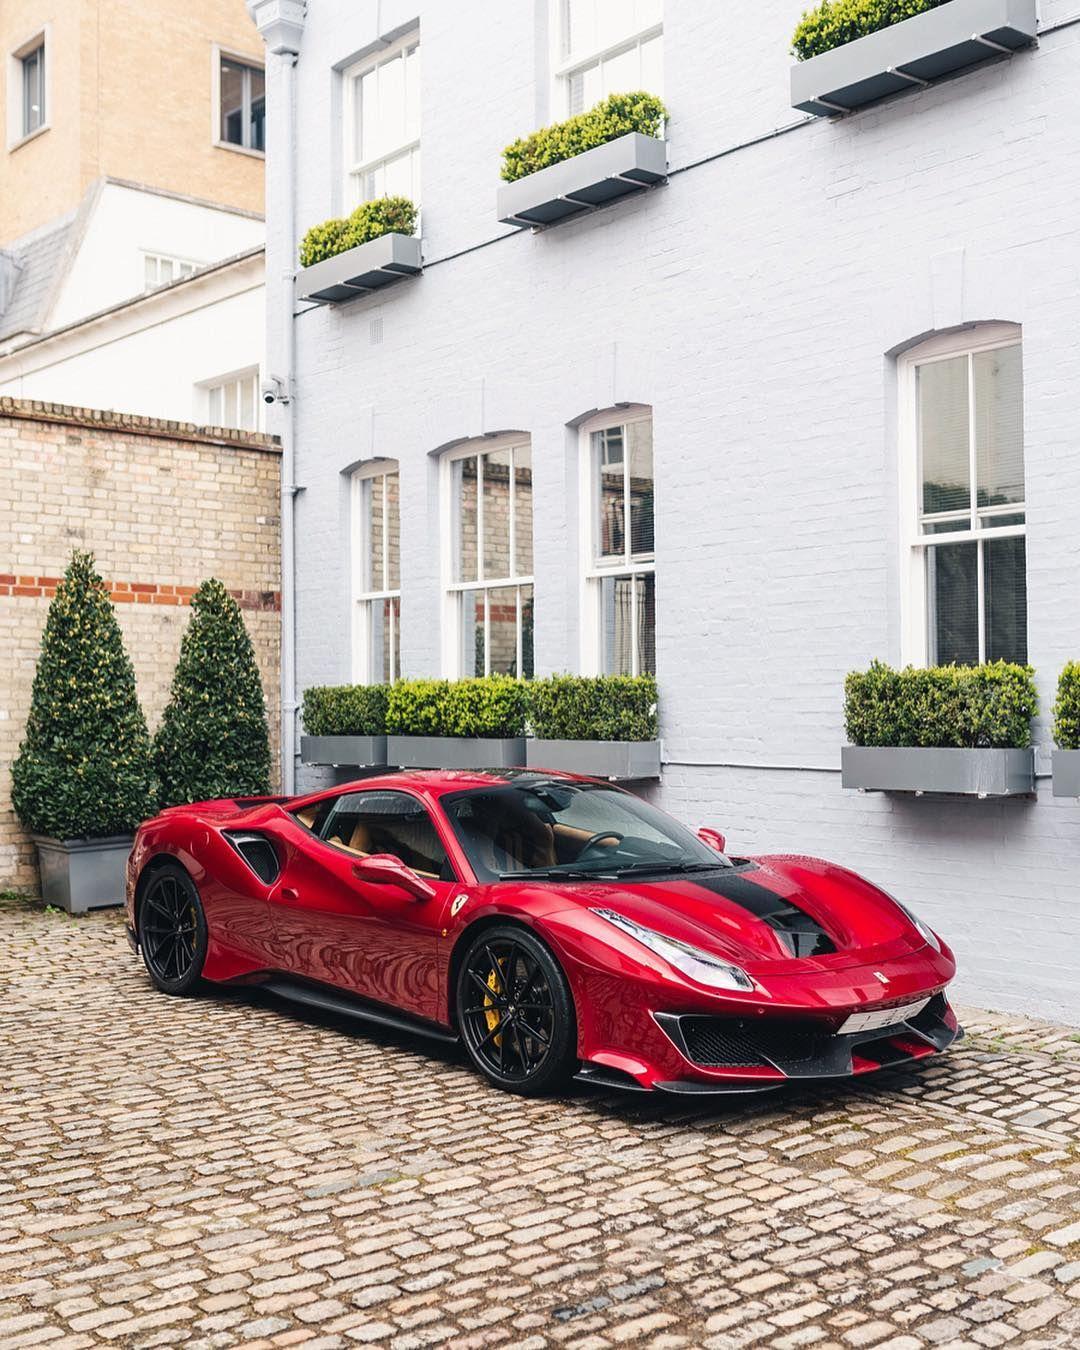 "Freddie Atkins on Instagram: ""Incredible spec on this freshly delivered Pista ?? #Ferrari #488Pista #London"""